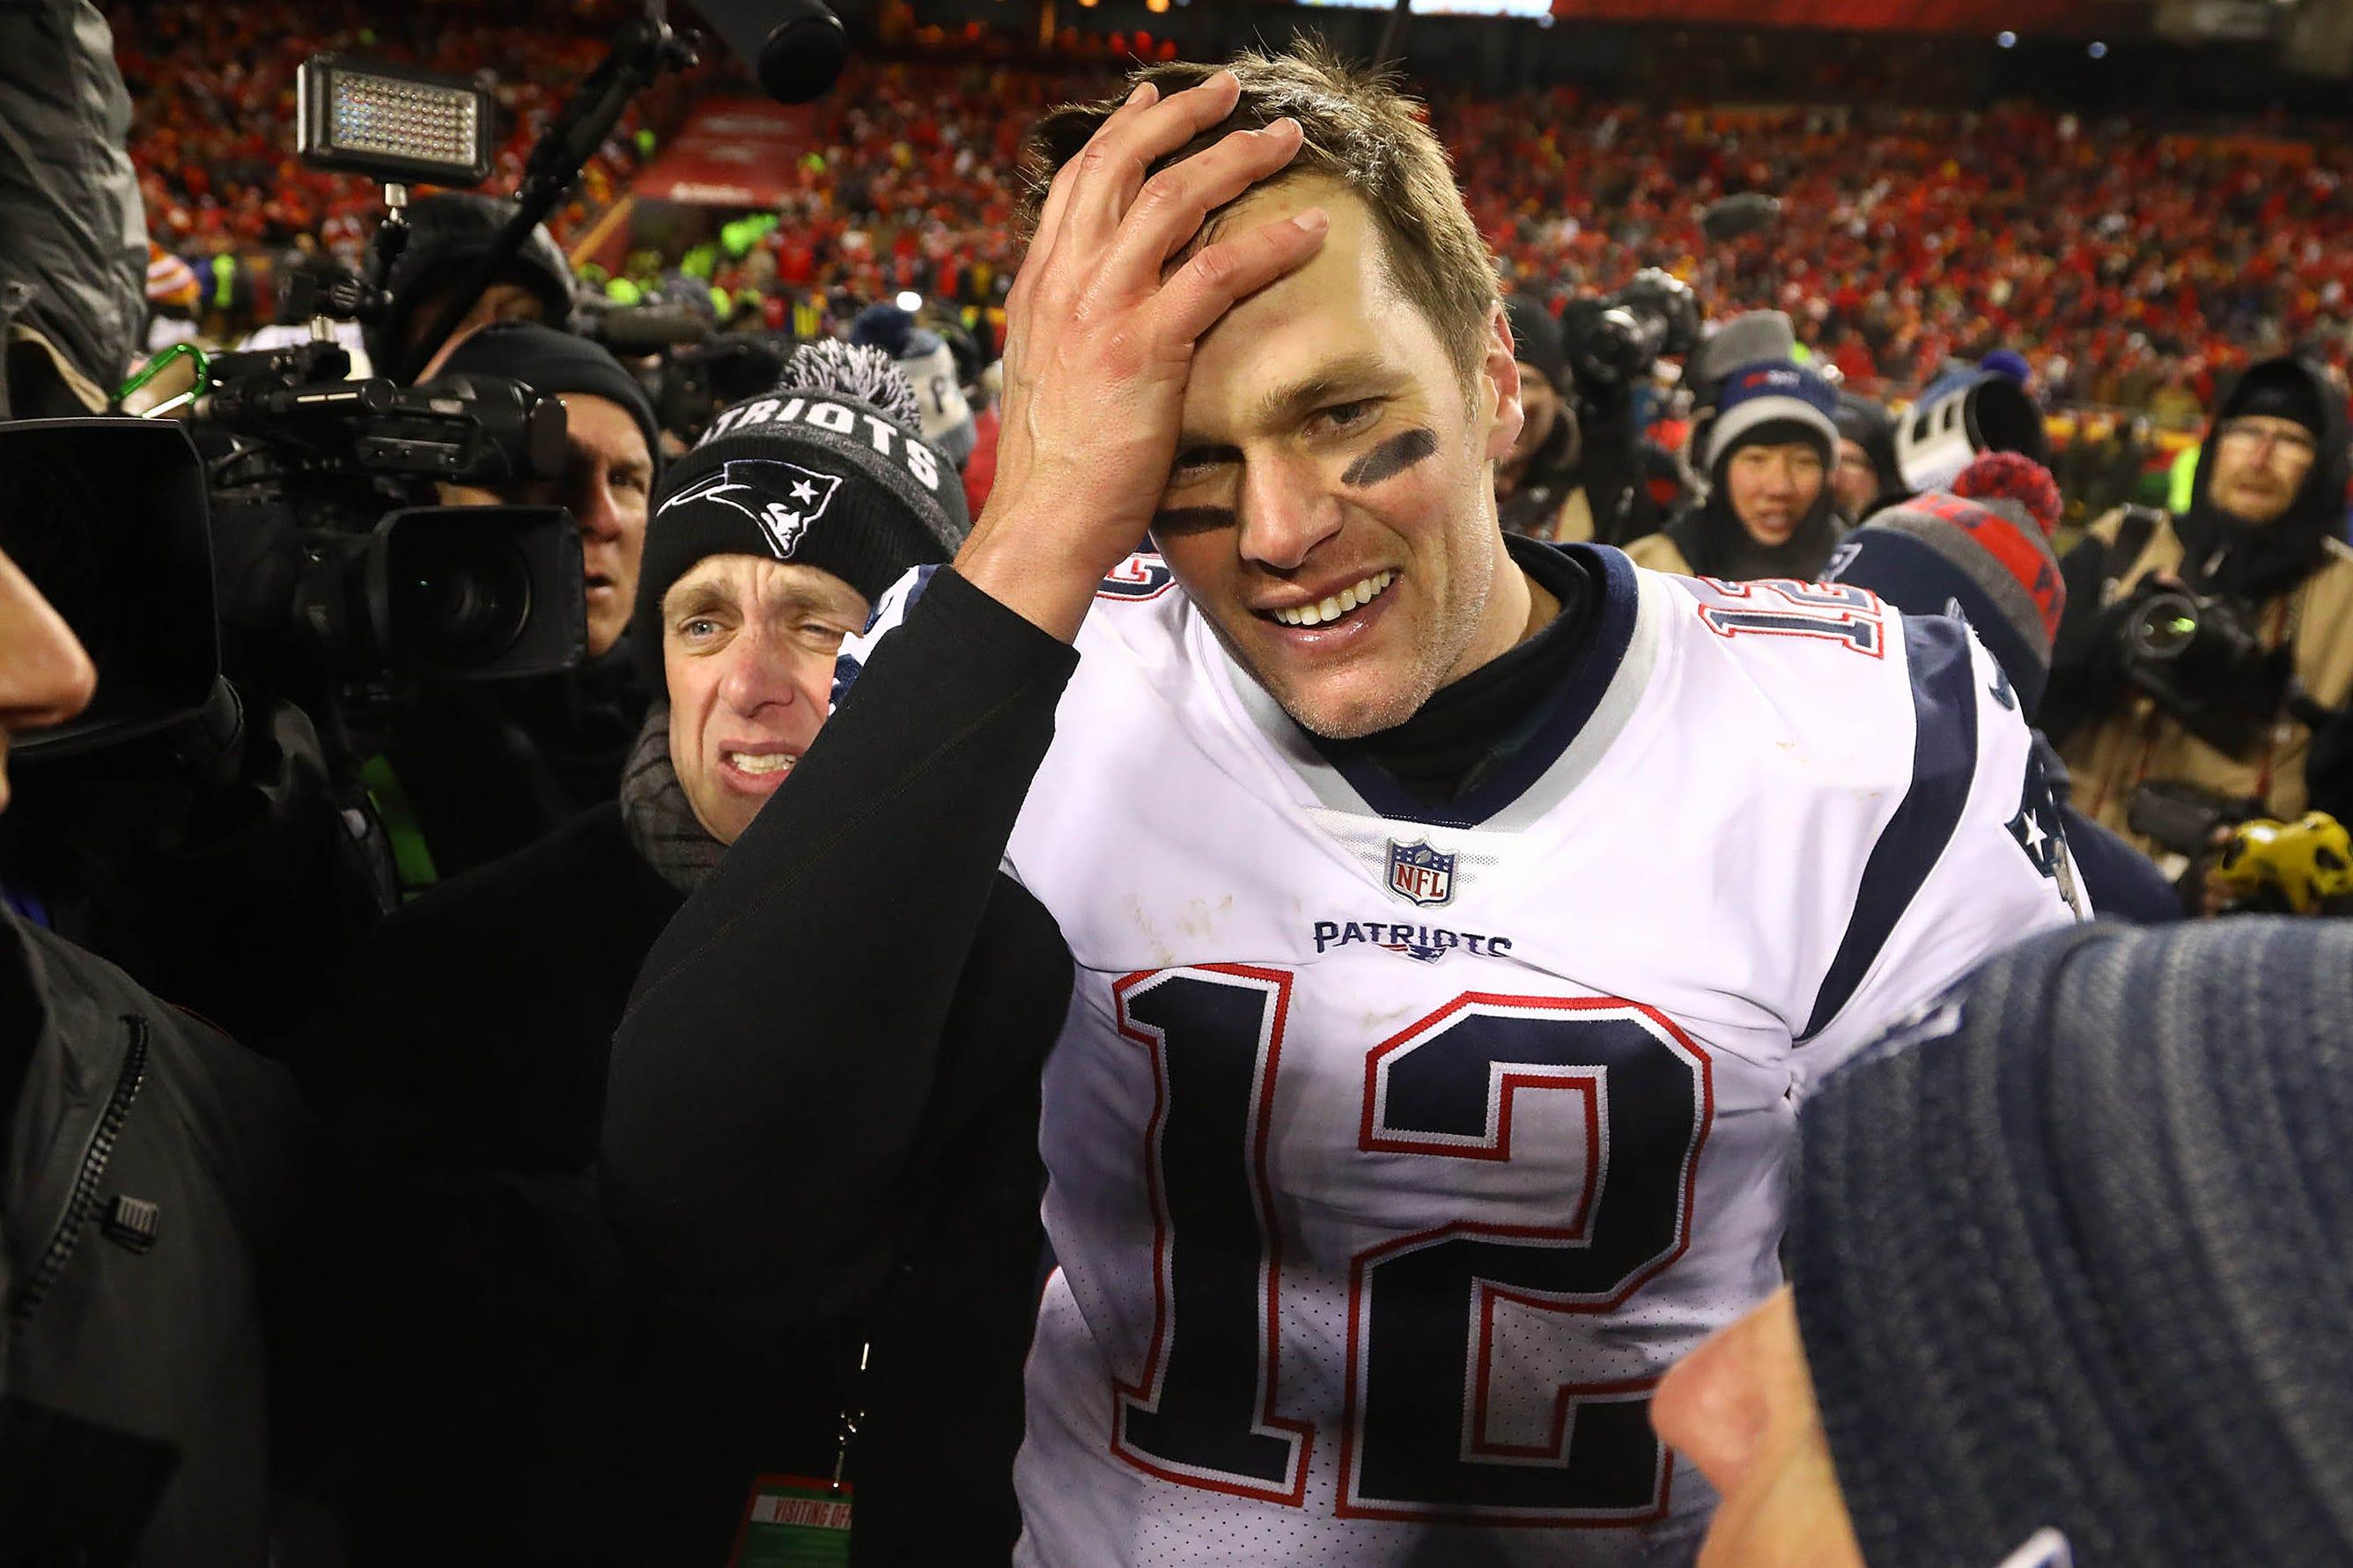 Tom Brady: 'Zero' chance I retire from NFL after Super Bowl